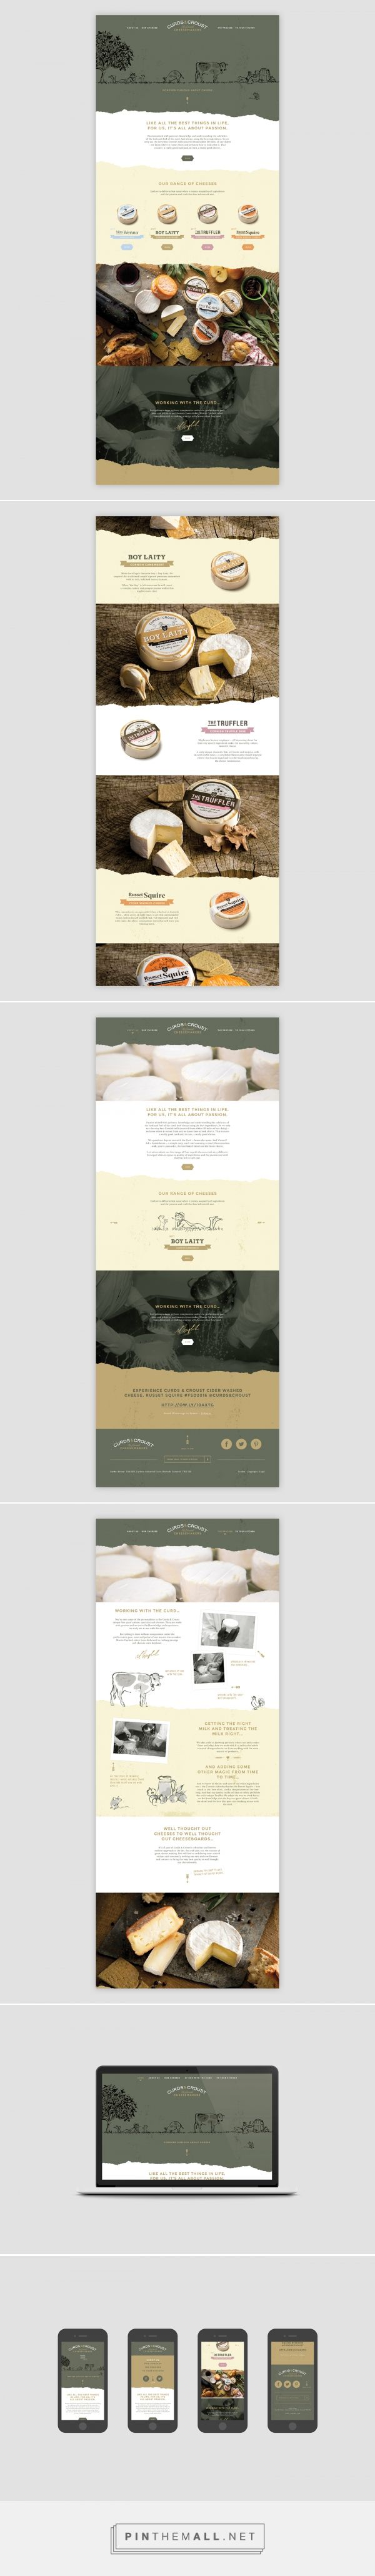 Curds & Croust Web Design by Friends Studio